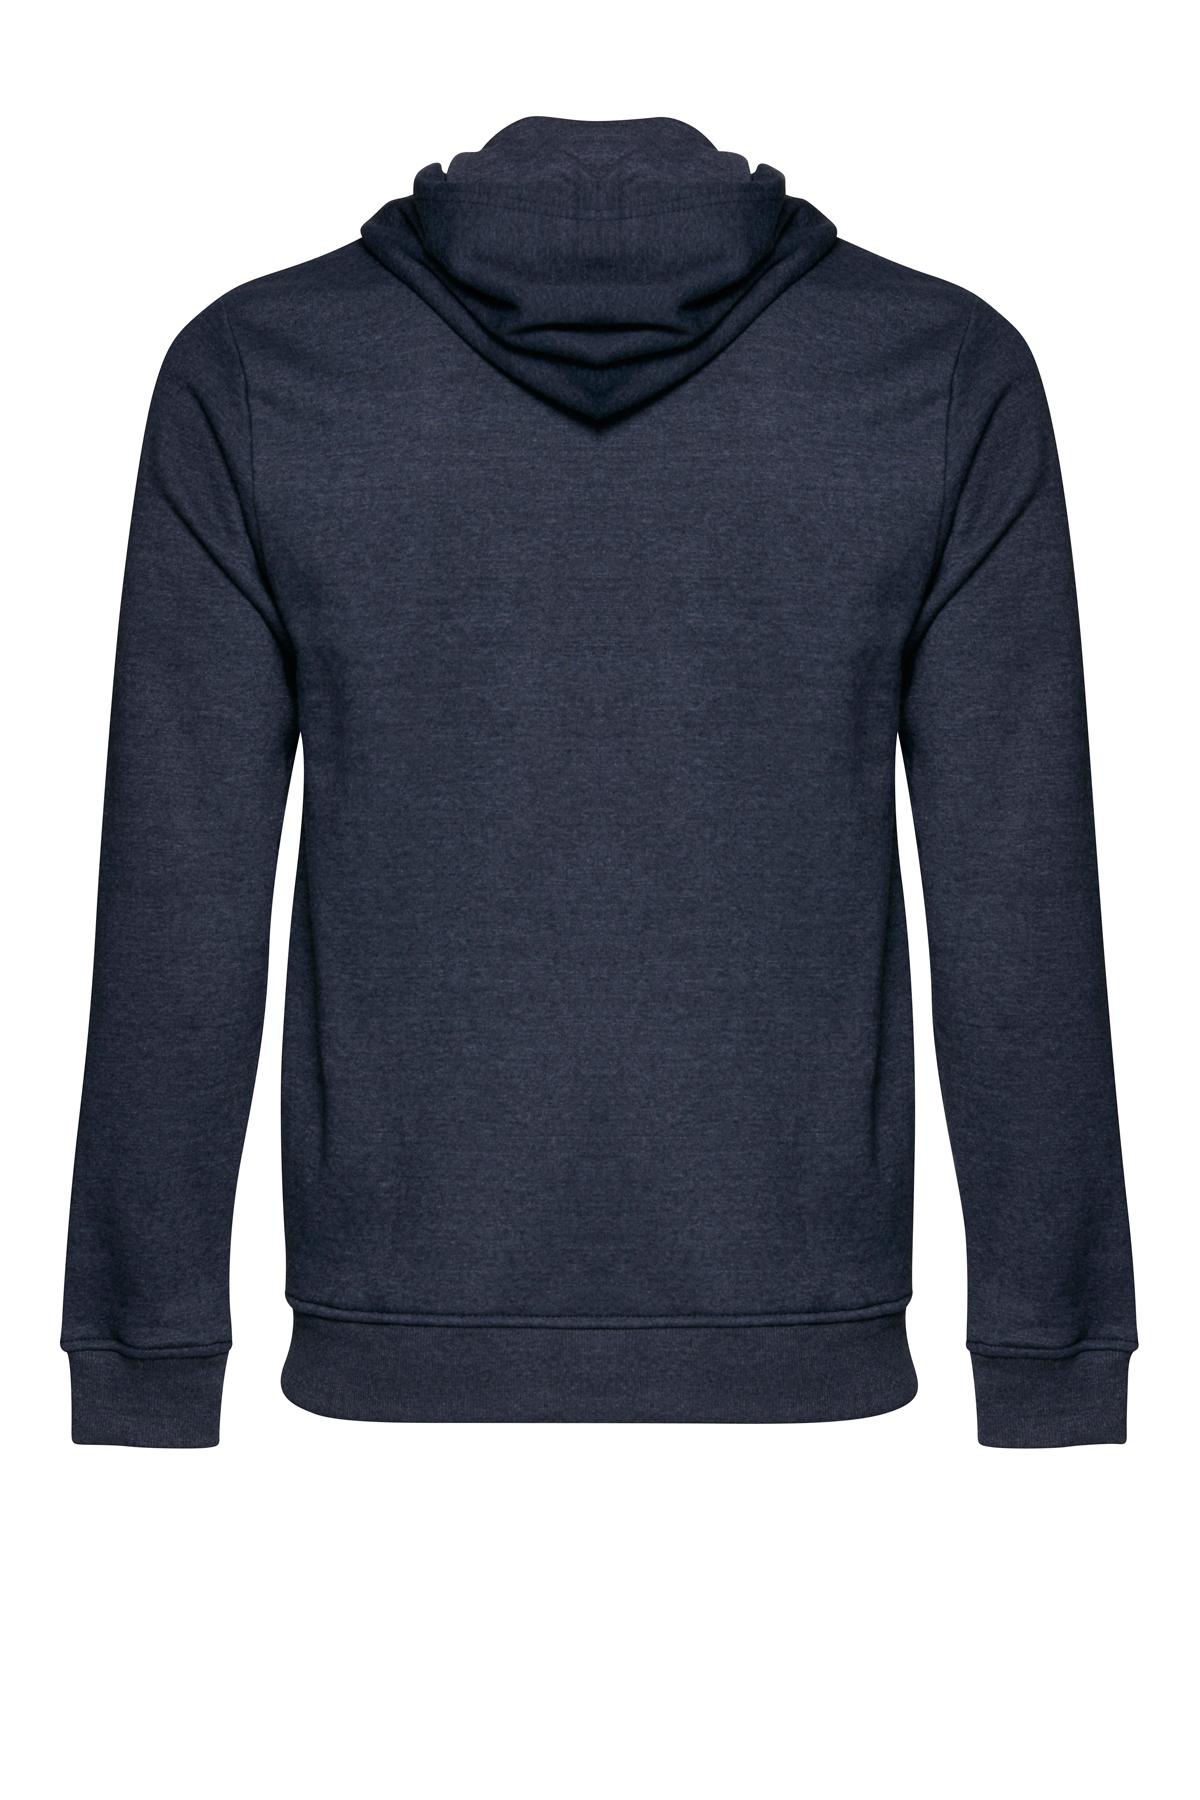 Marinblå melerad Sweatshirt från Blend He – Köp Marinblå melerad Sweatshirt från stl. S-3XL här